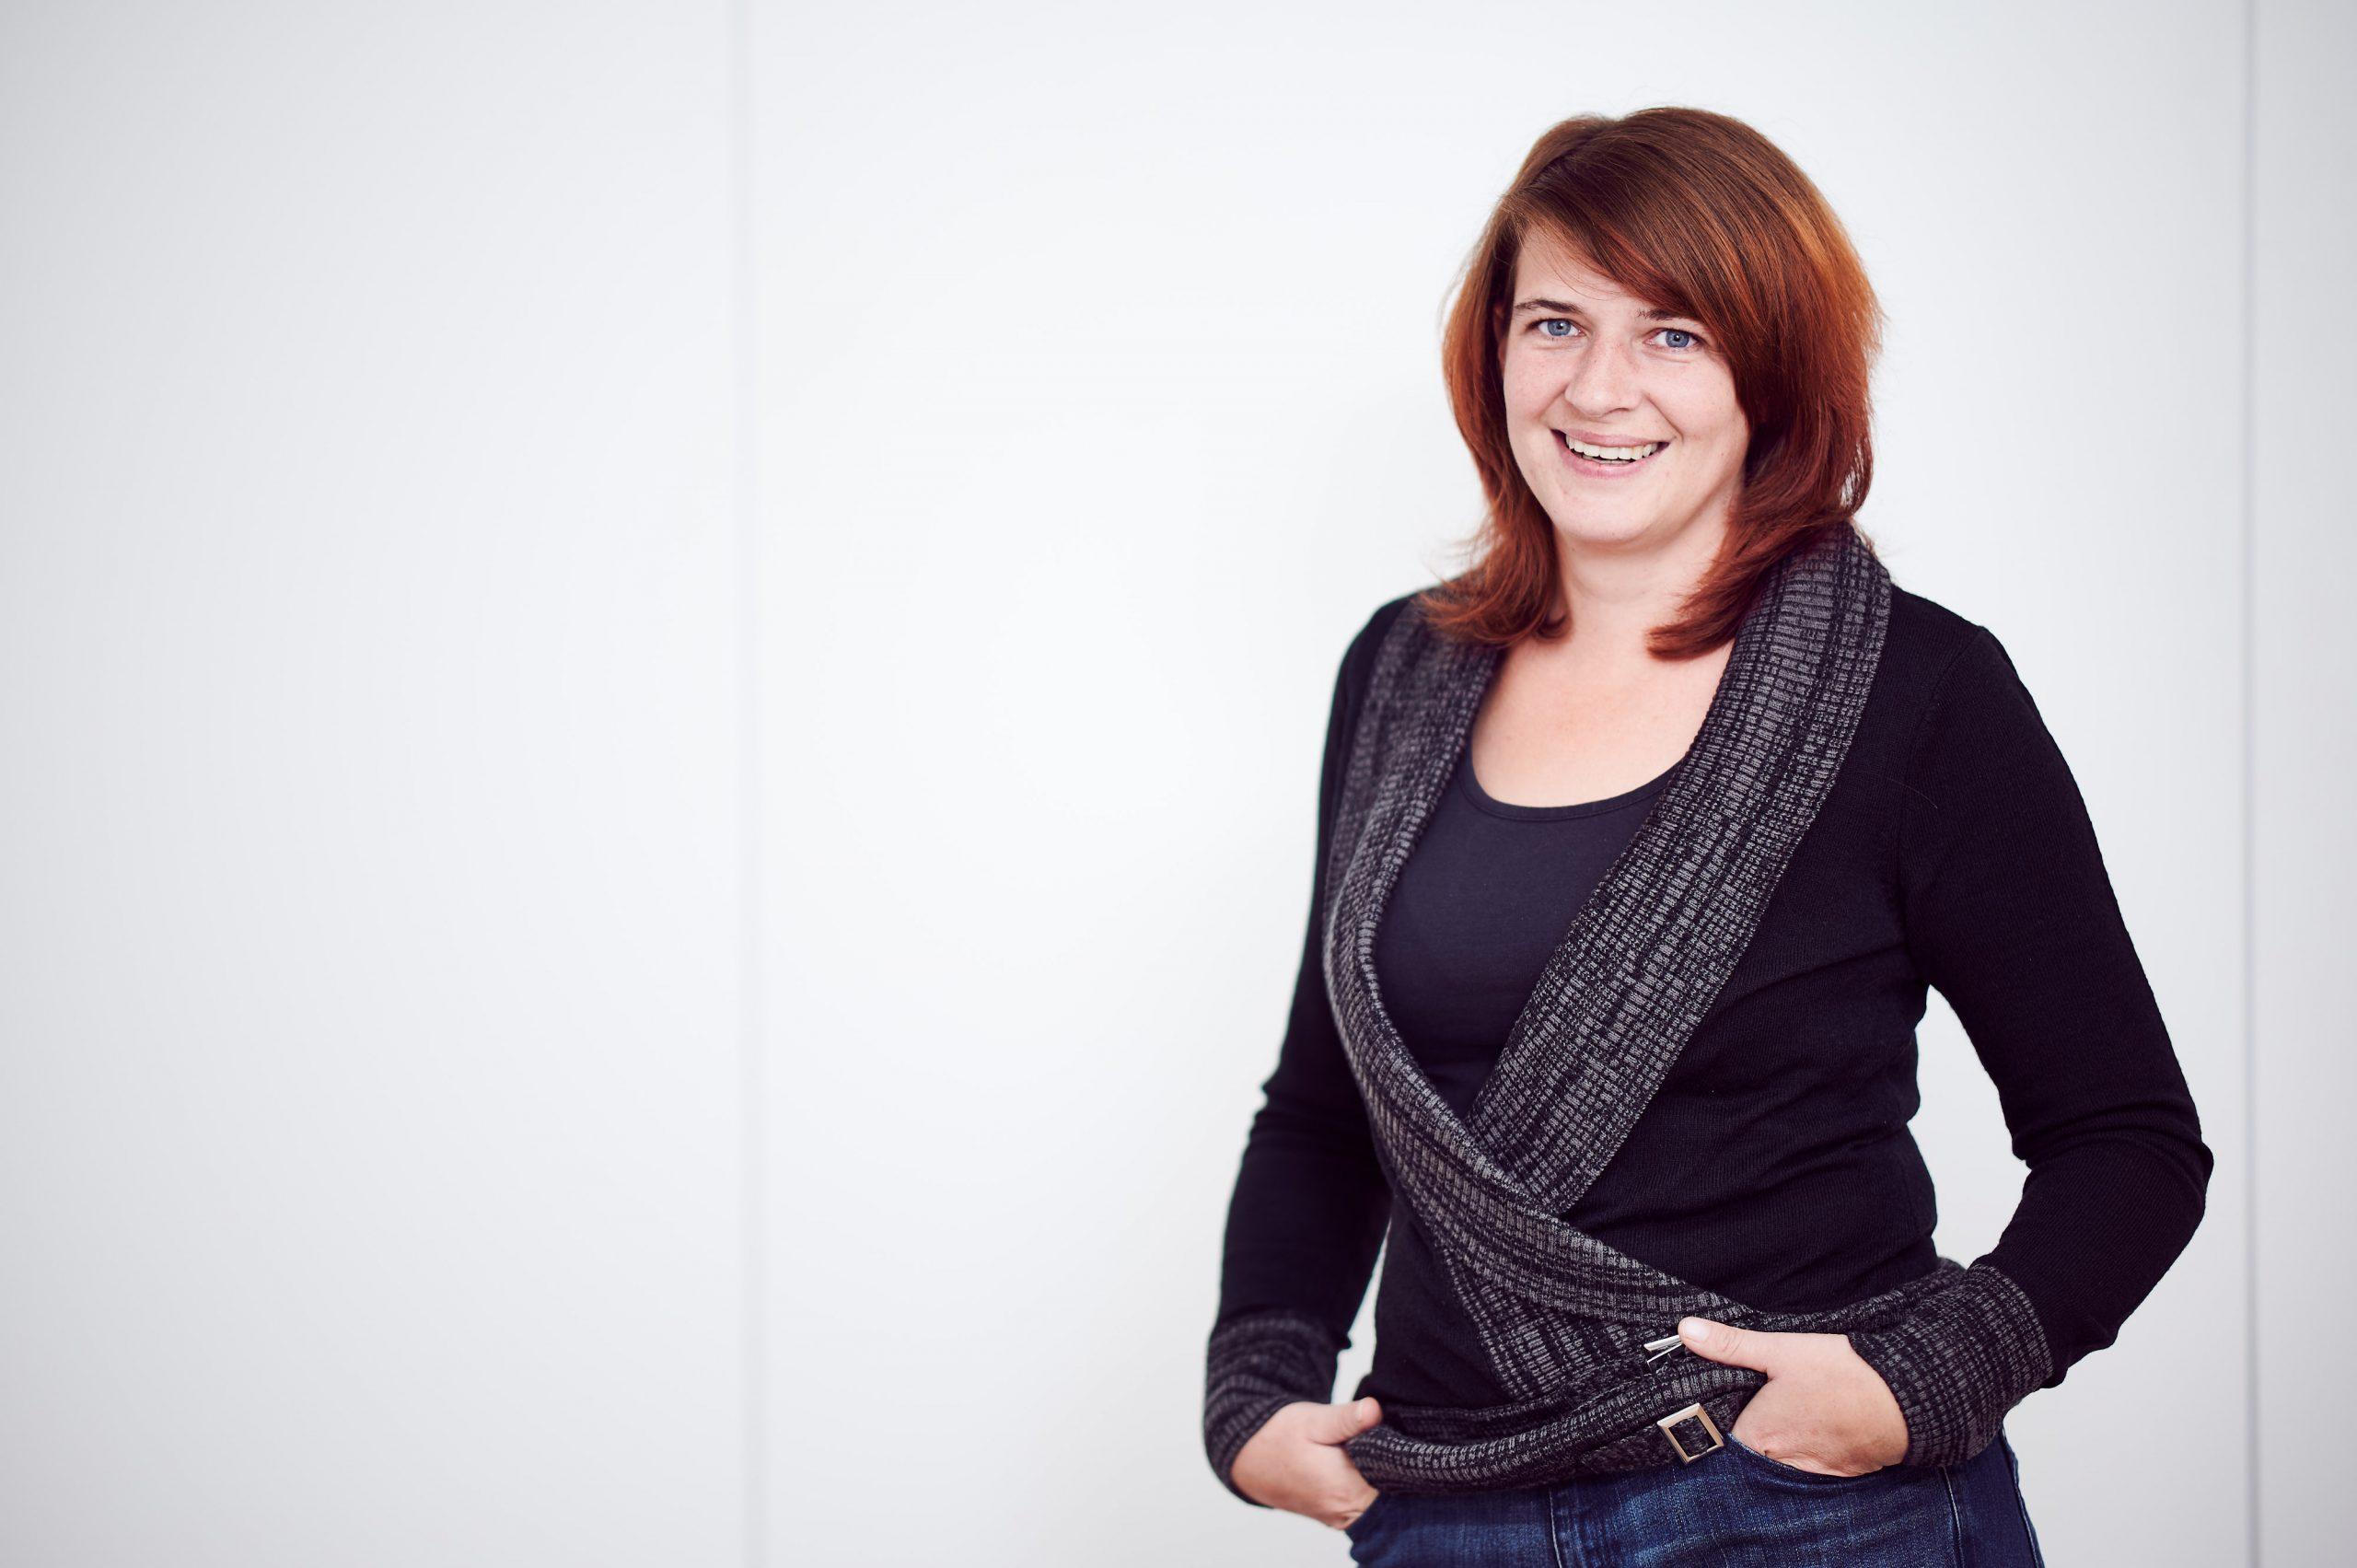 Sabina Grillmeier-Ladentrog